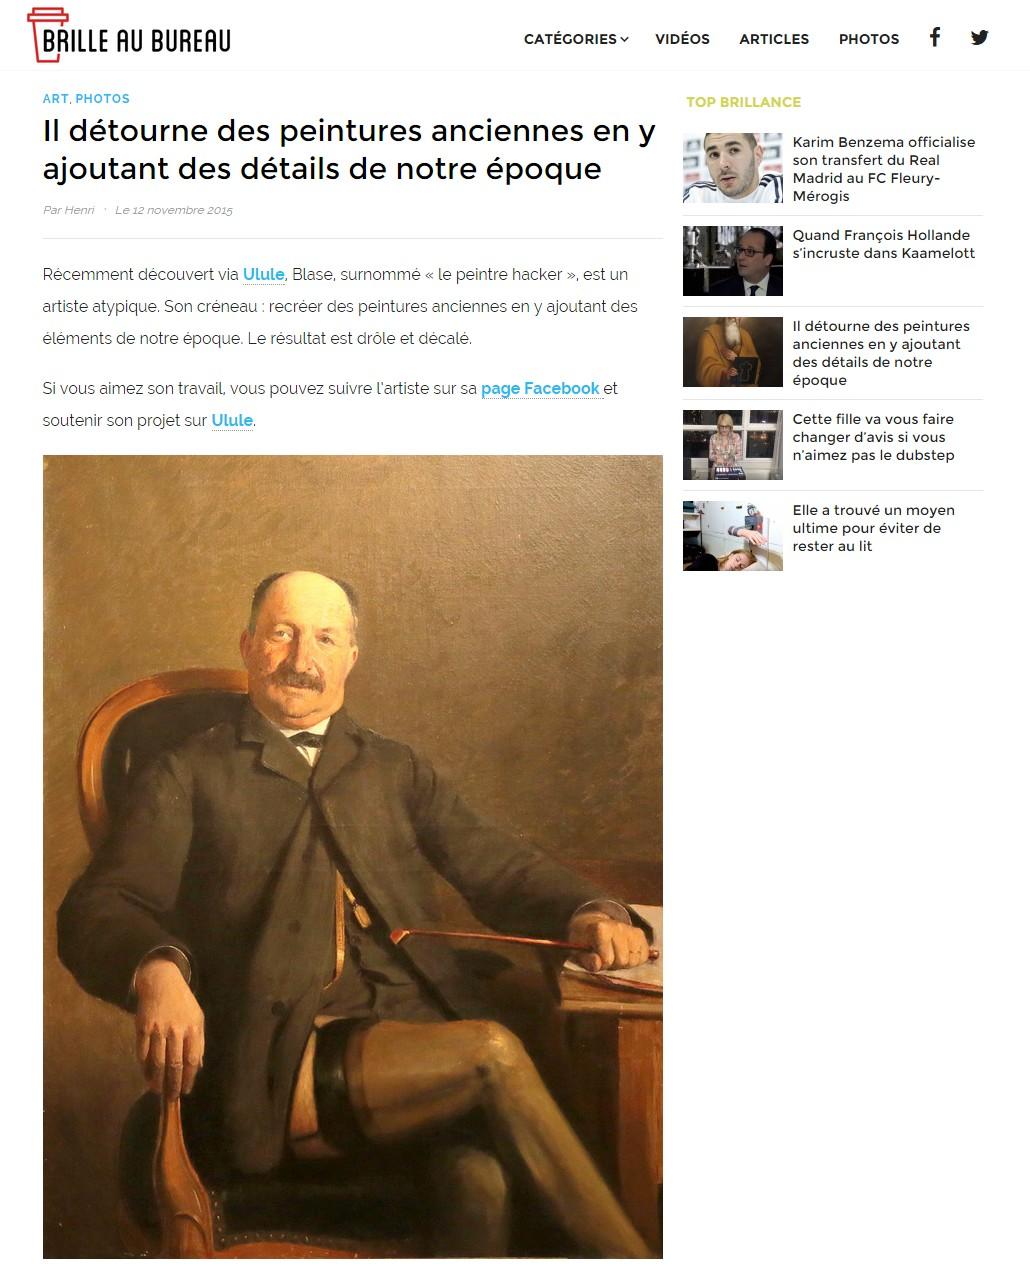 article Blase Brille au bureau 12.11.2015